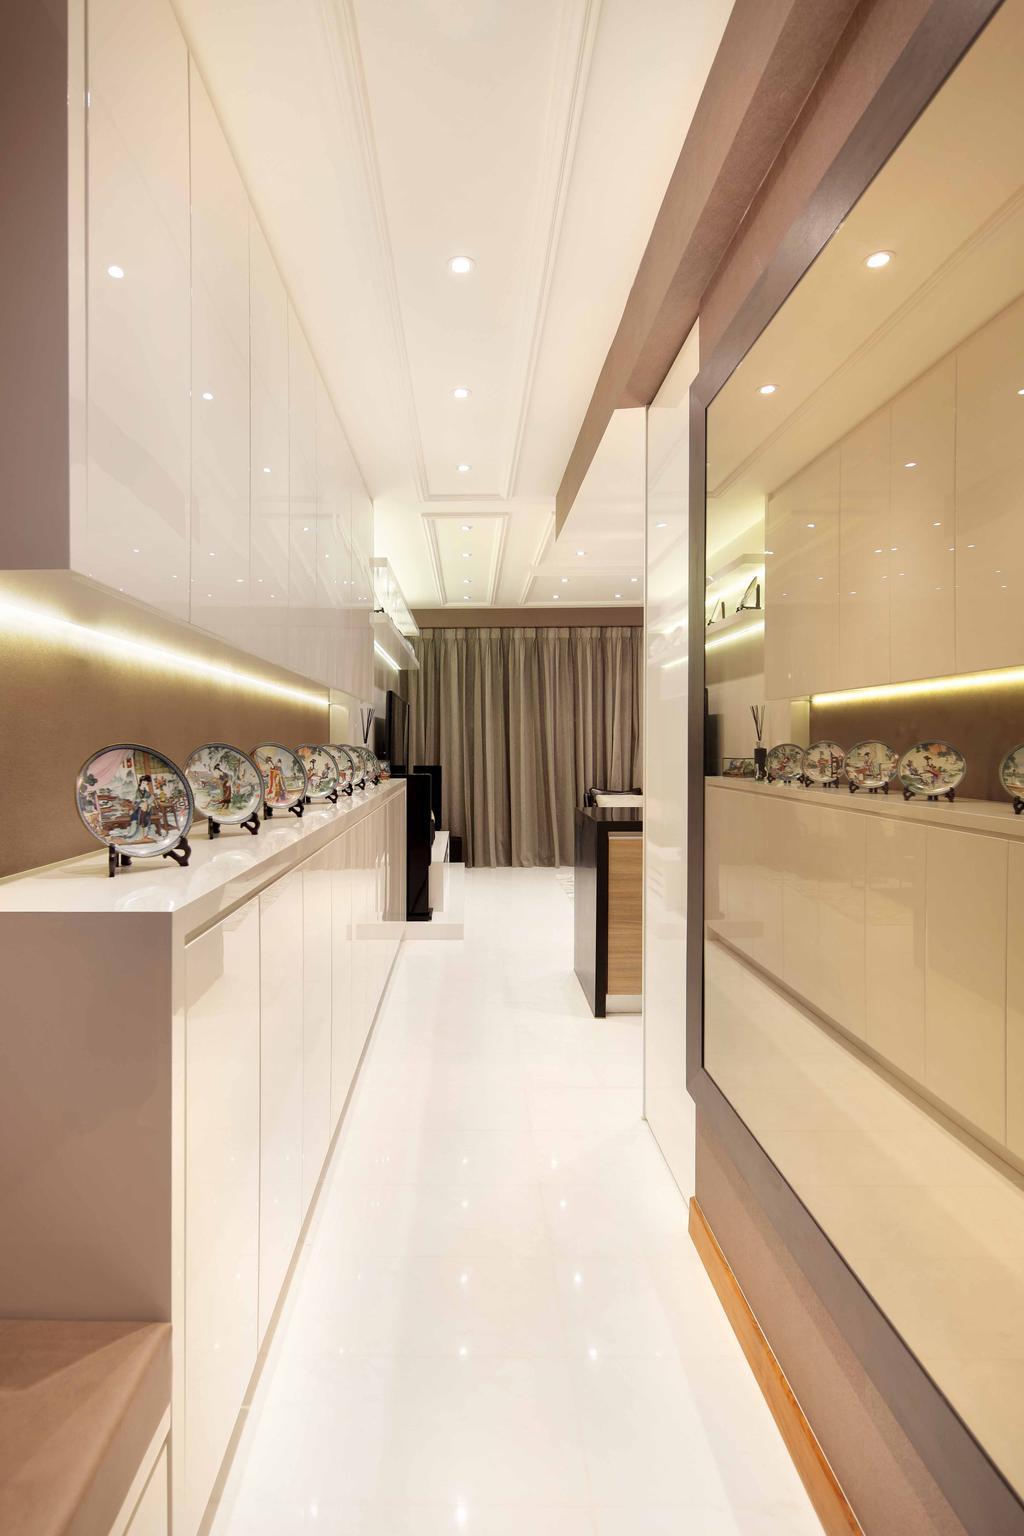 Transitional, Condo, Living Room, Shore Residence - Amber Road, Interior Designer, Space Define Interior, Mirror, Display, Concealed Lighting, Cabinet, Storage, Architrave, Recessed Lighting, Display Platform, Indoors, Interior Design